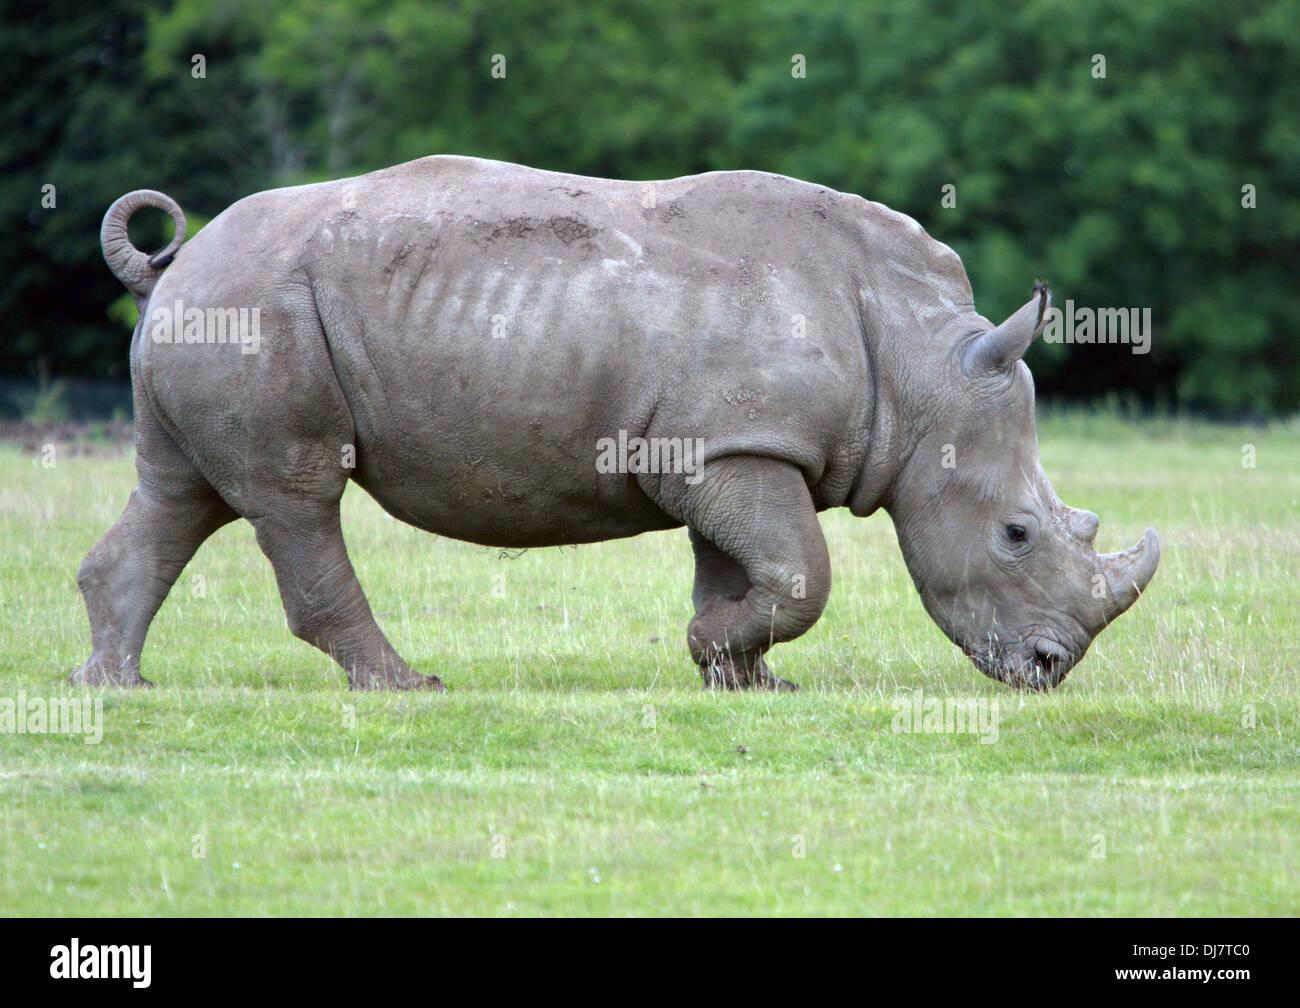 A Nepalese Rhino In Captivity - Stock Image